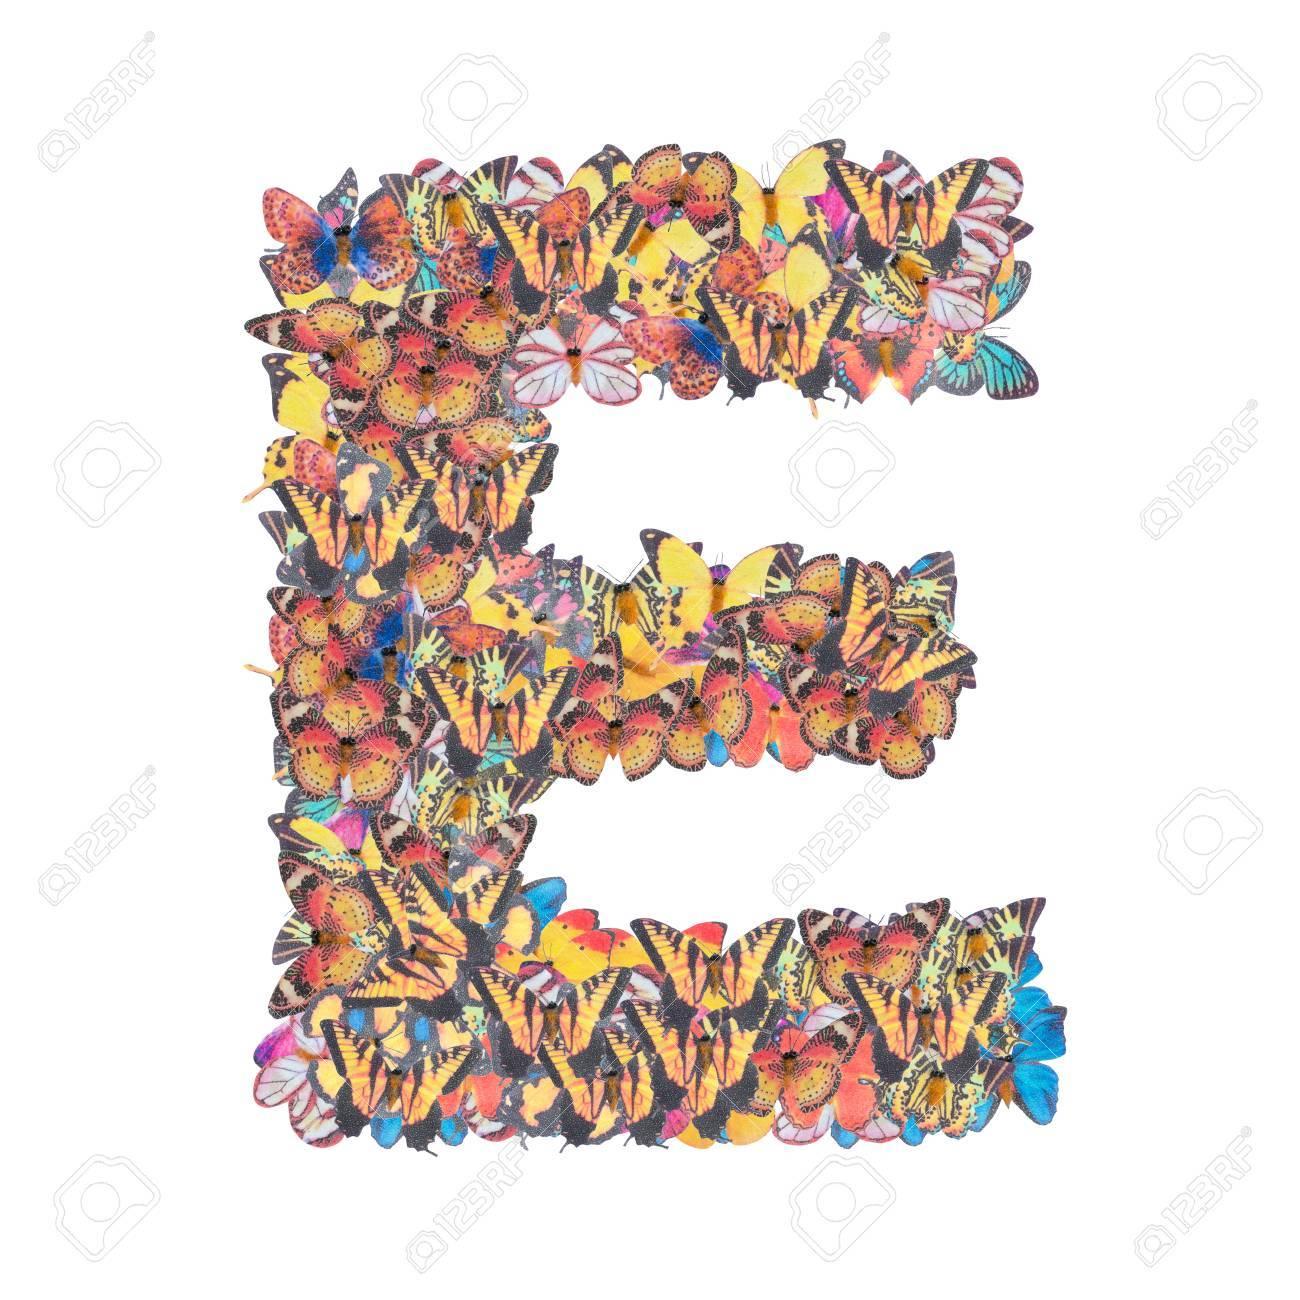 Letter e alphabet with butterfly abc concept type as logo isolated letter e alphabet with butterfly abc concept type as logo isolated on white background stock photo altavistaventures Images